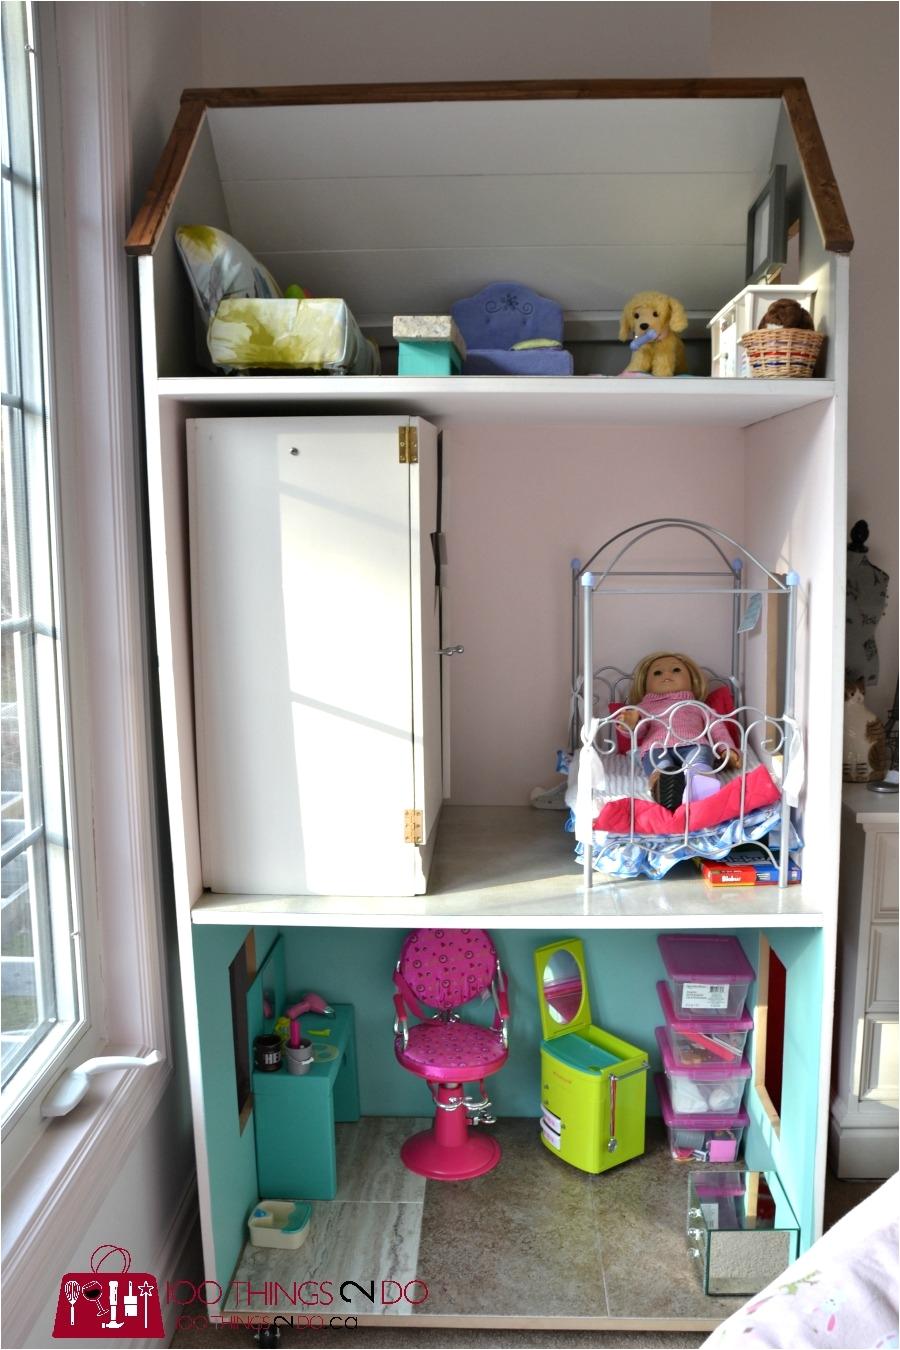 Diy American Girl Doll House Plans American Girl Dollhouse Plans Pdf